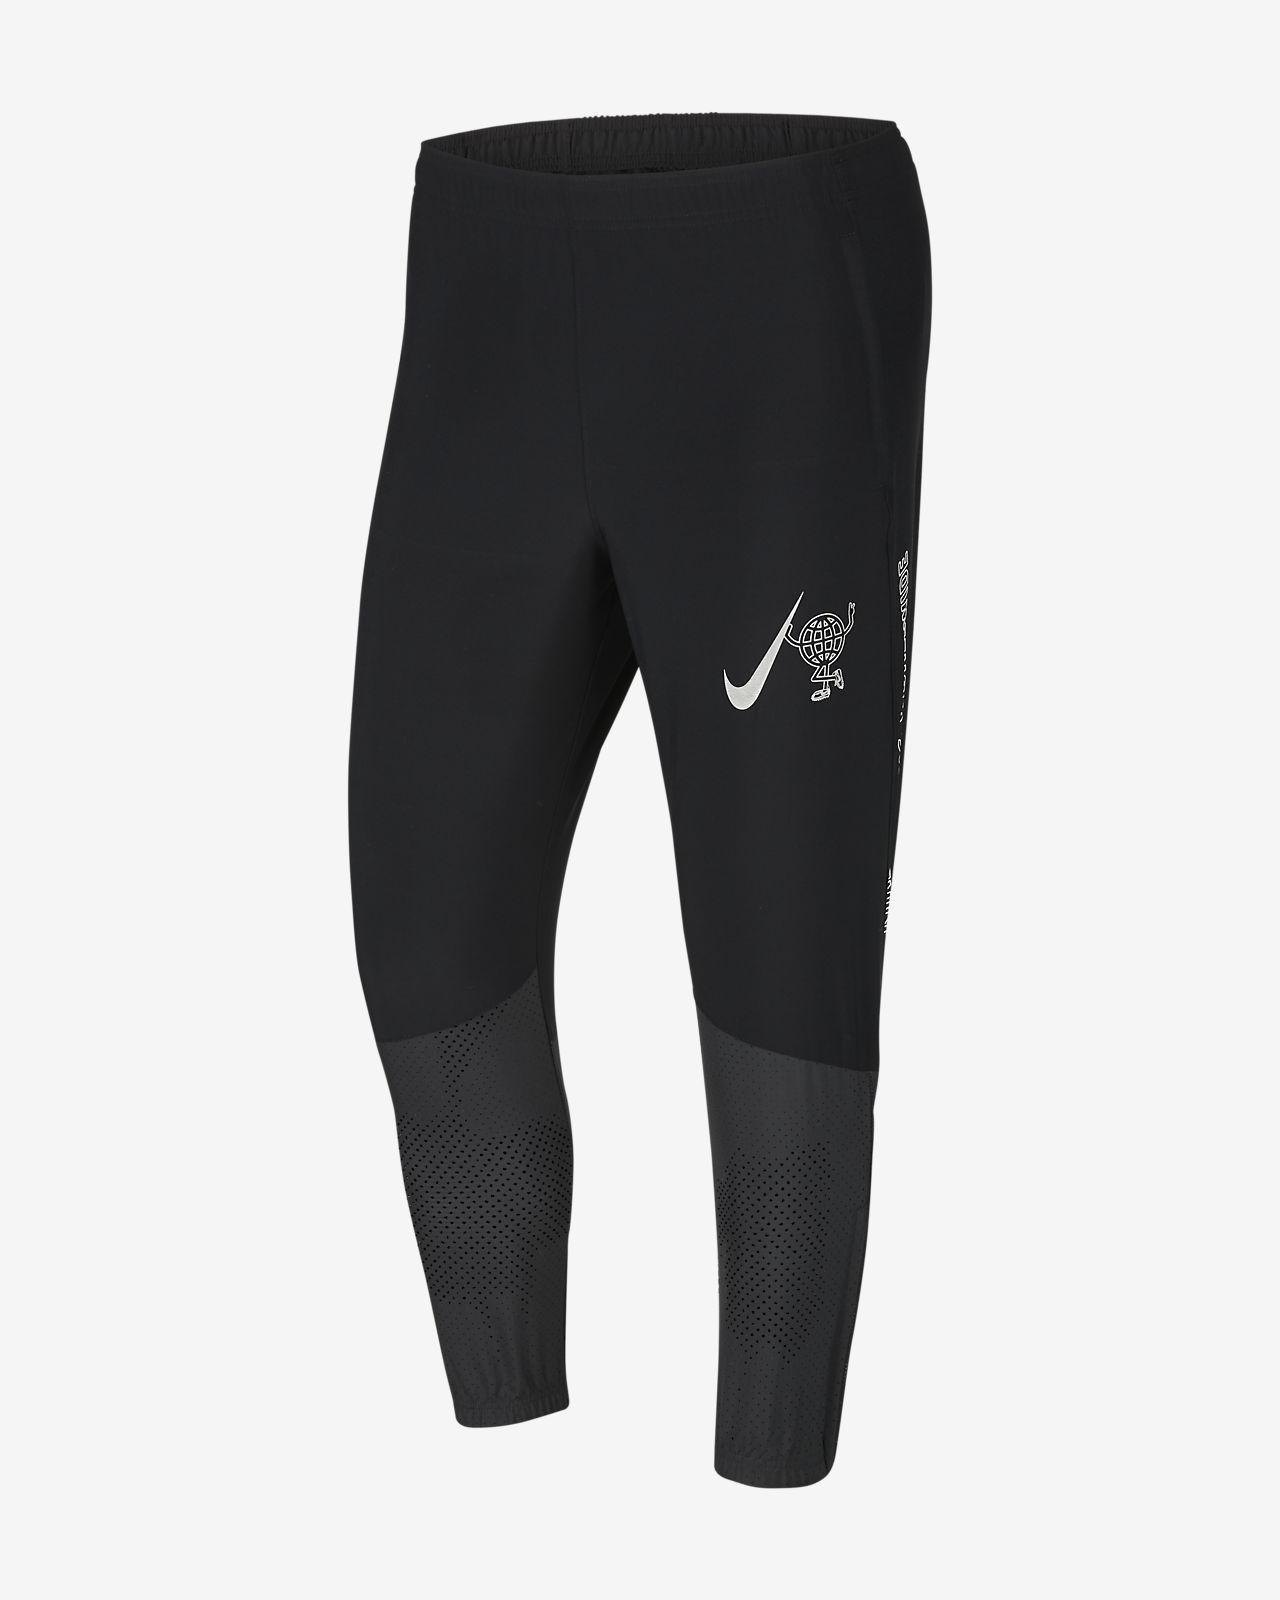 Nike Essential Wild Run Men's Running Trousers